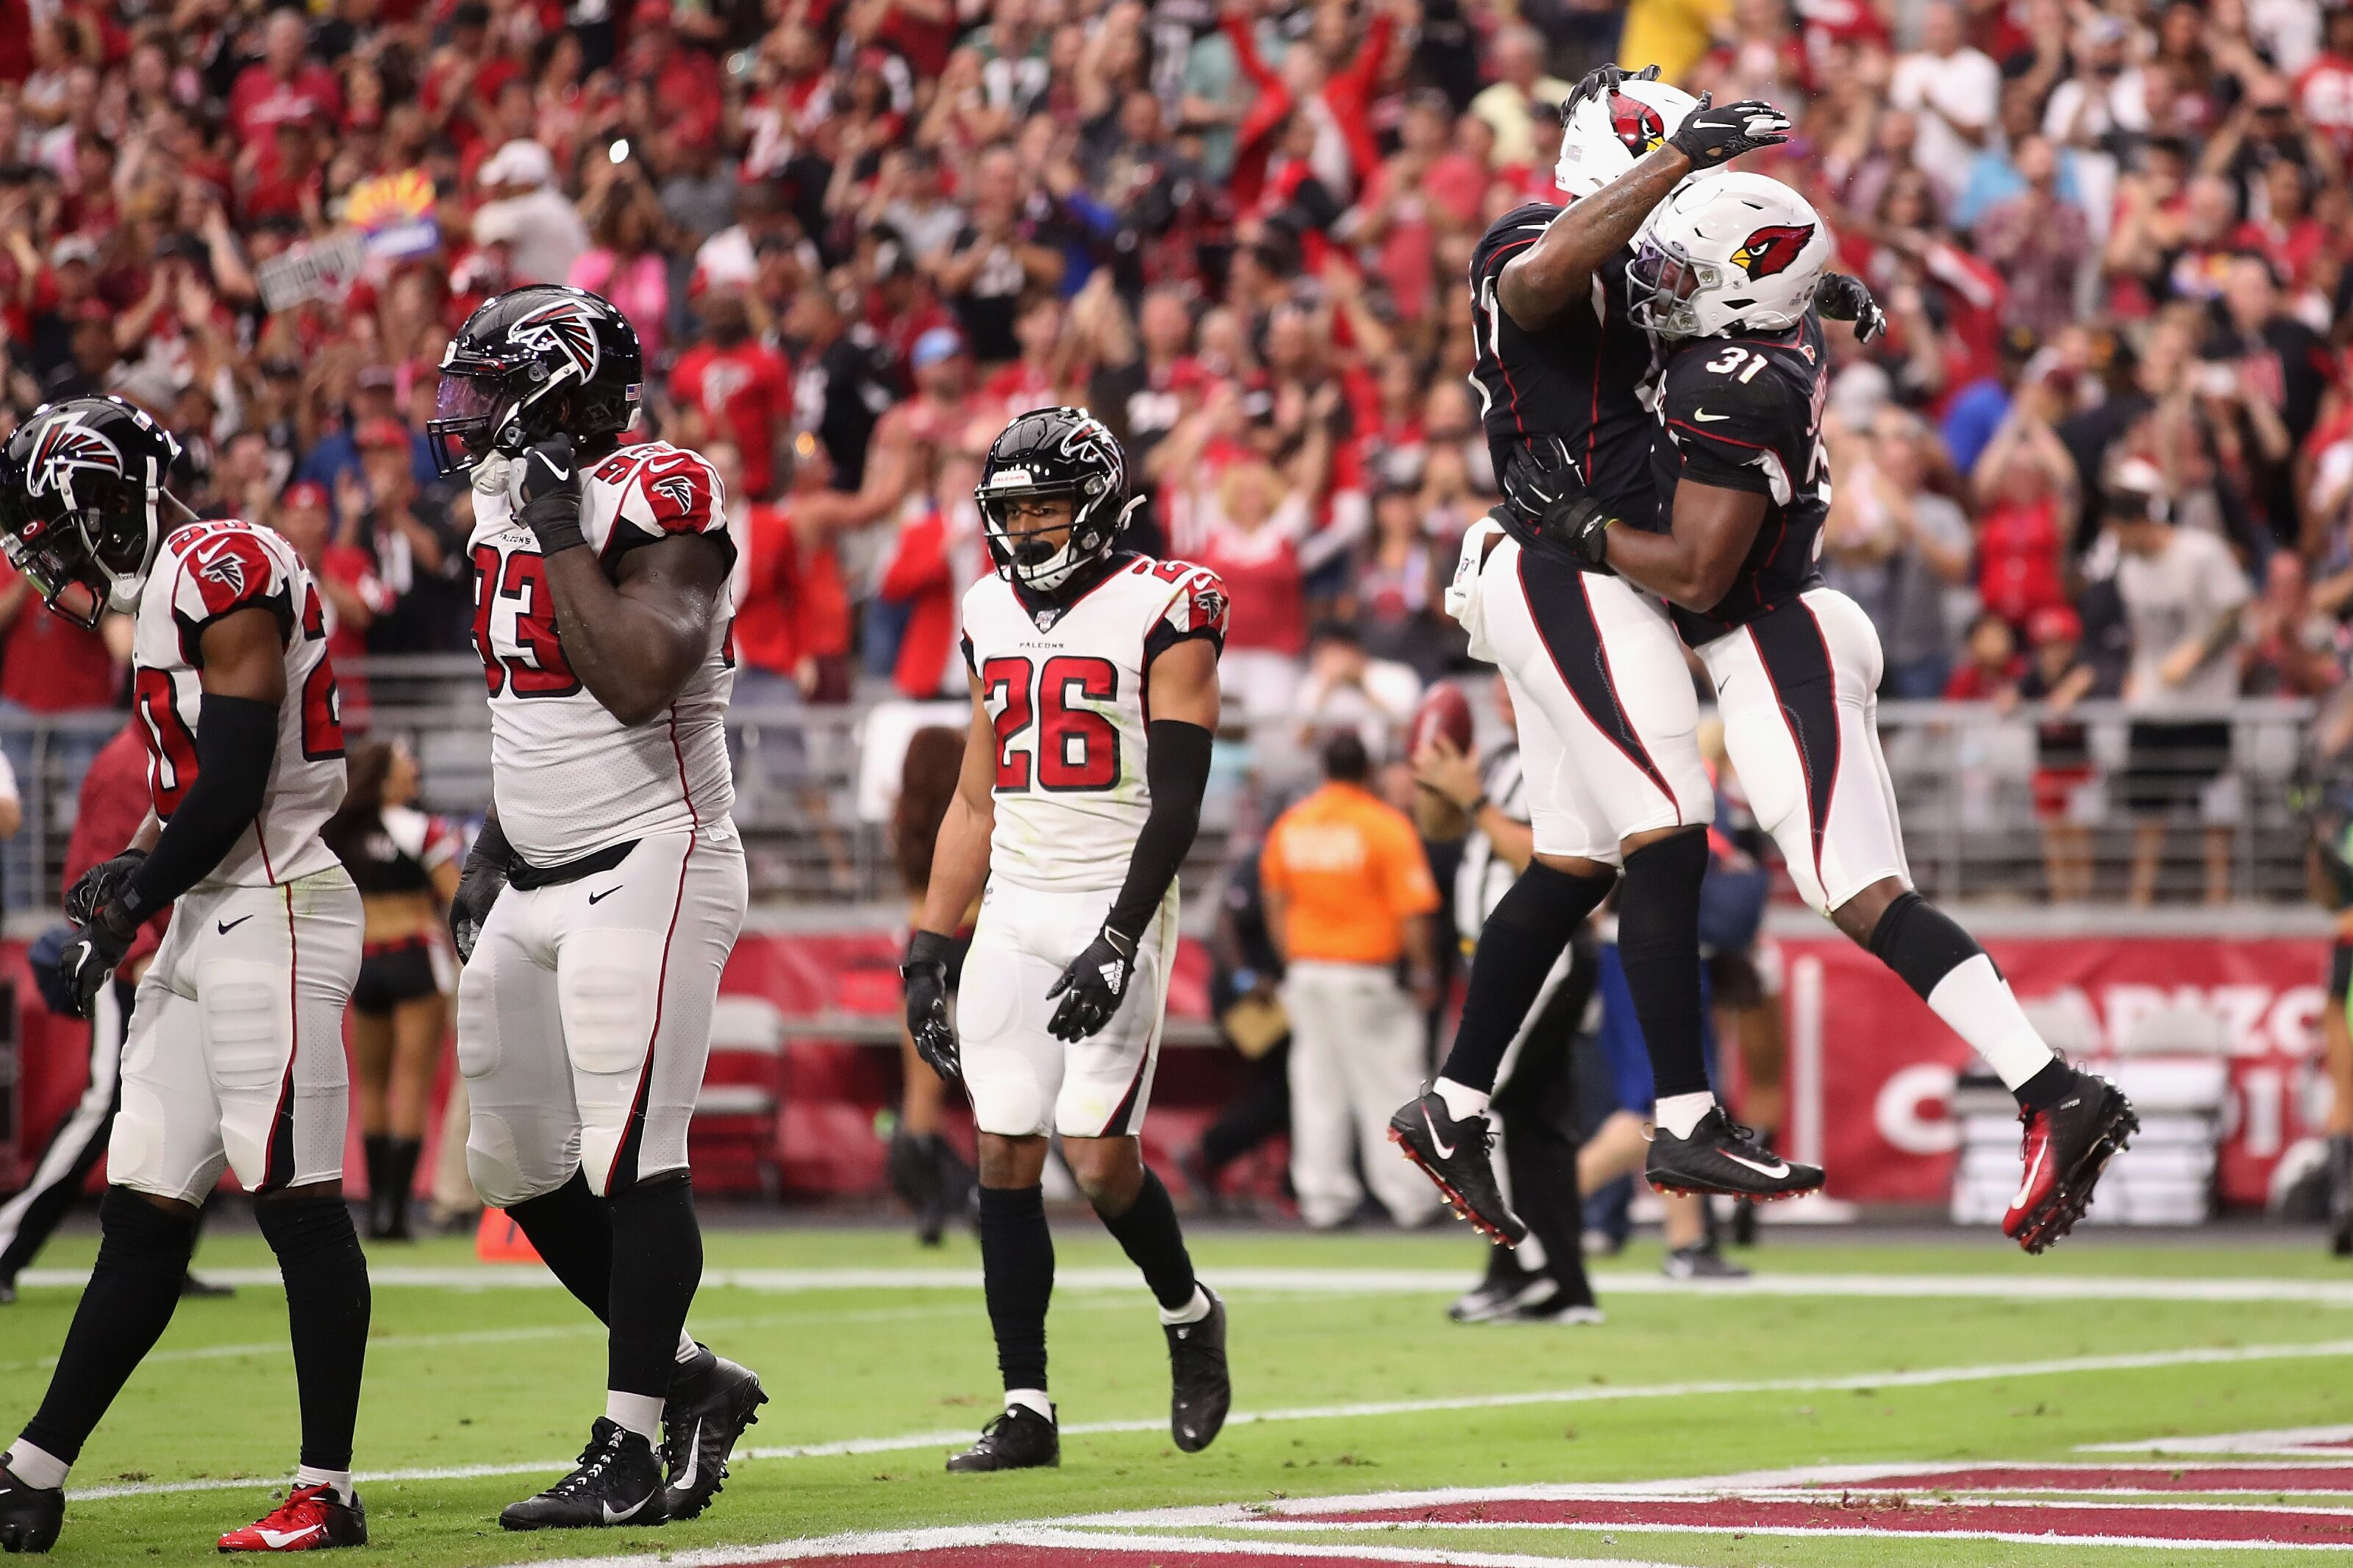 Falcons, Dan Quinn, Matt Bryant tie a bow on worst week in Atlanta sports history